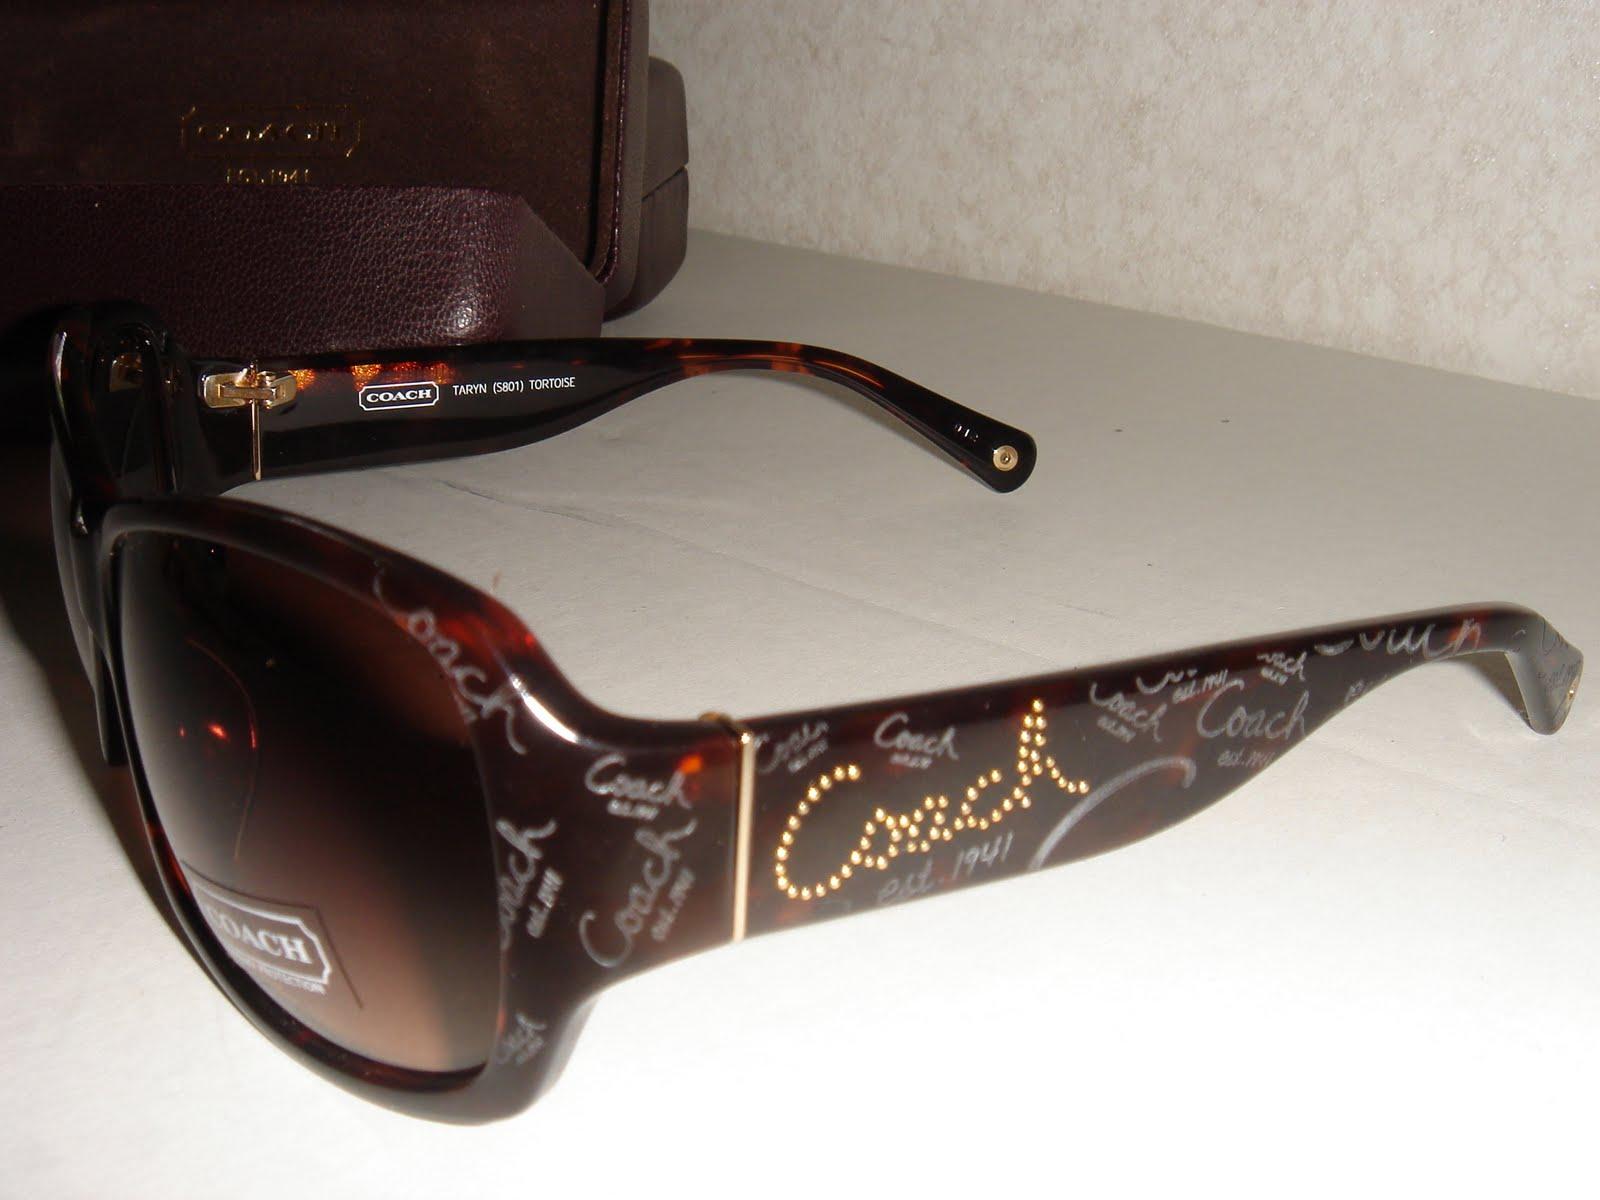 05c98f26ae011 ... spain coach sunglasses taryn s801 tortoise w case c834d 9cb9f ...